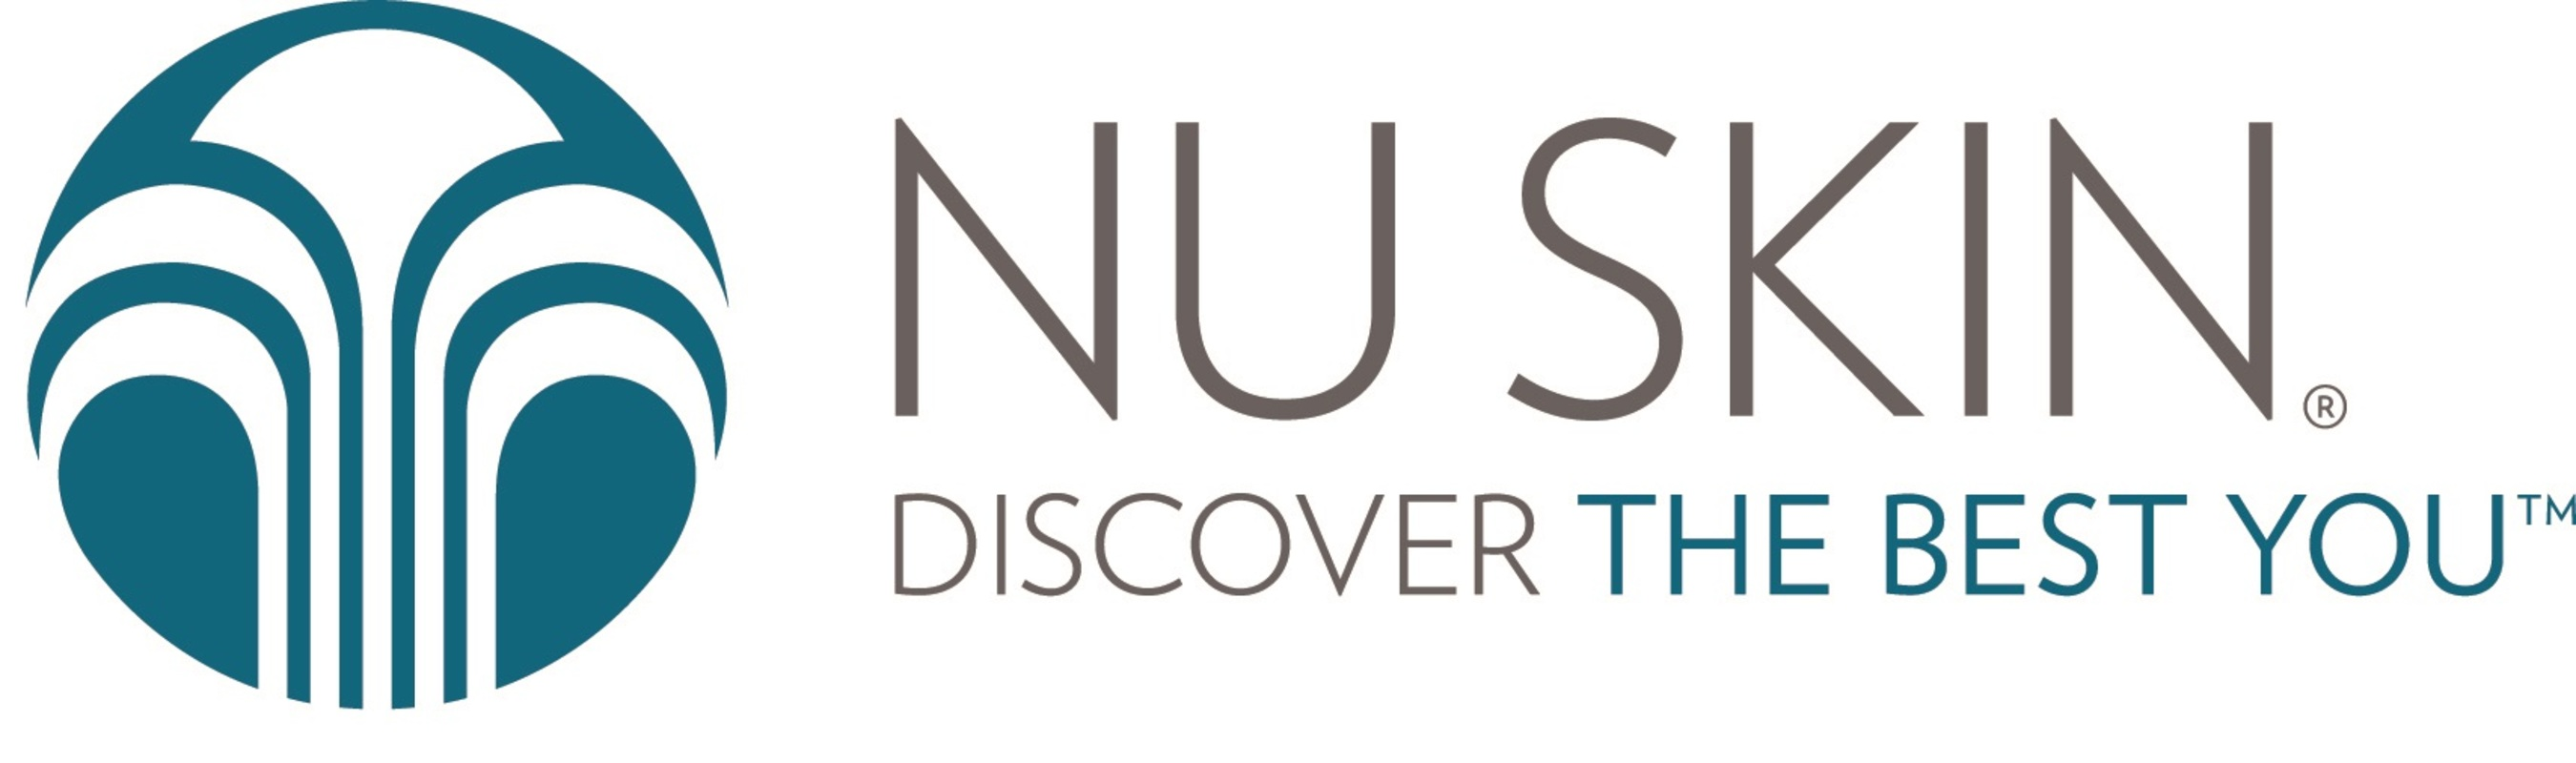 Nu Skin Enterprises, Inc. logo